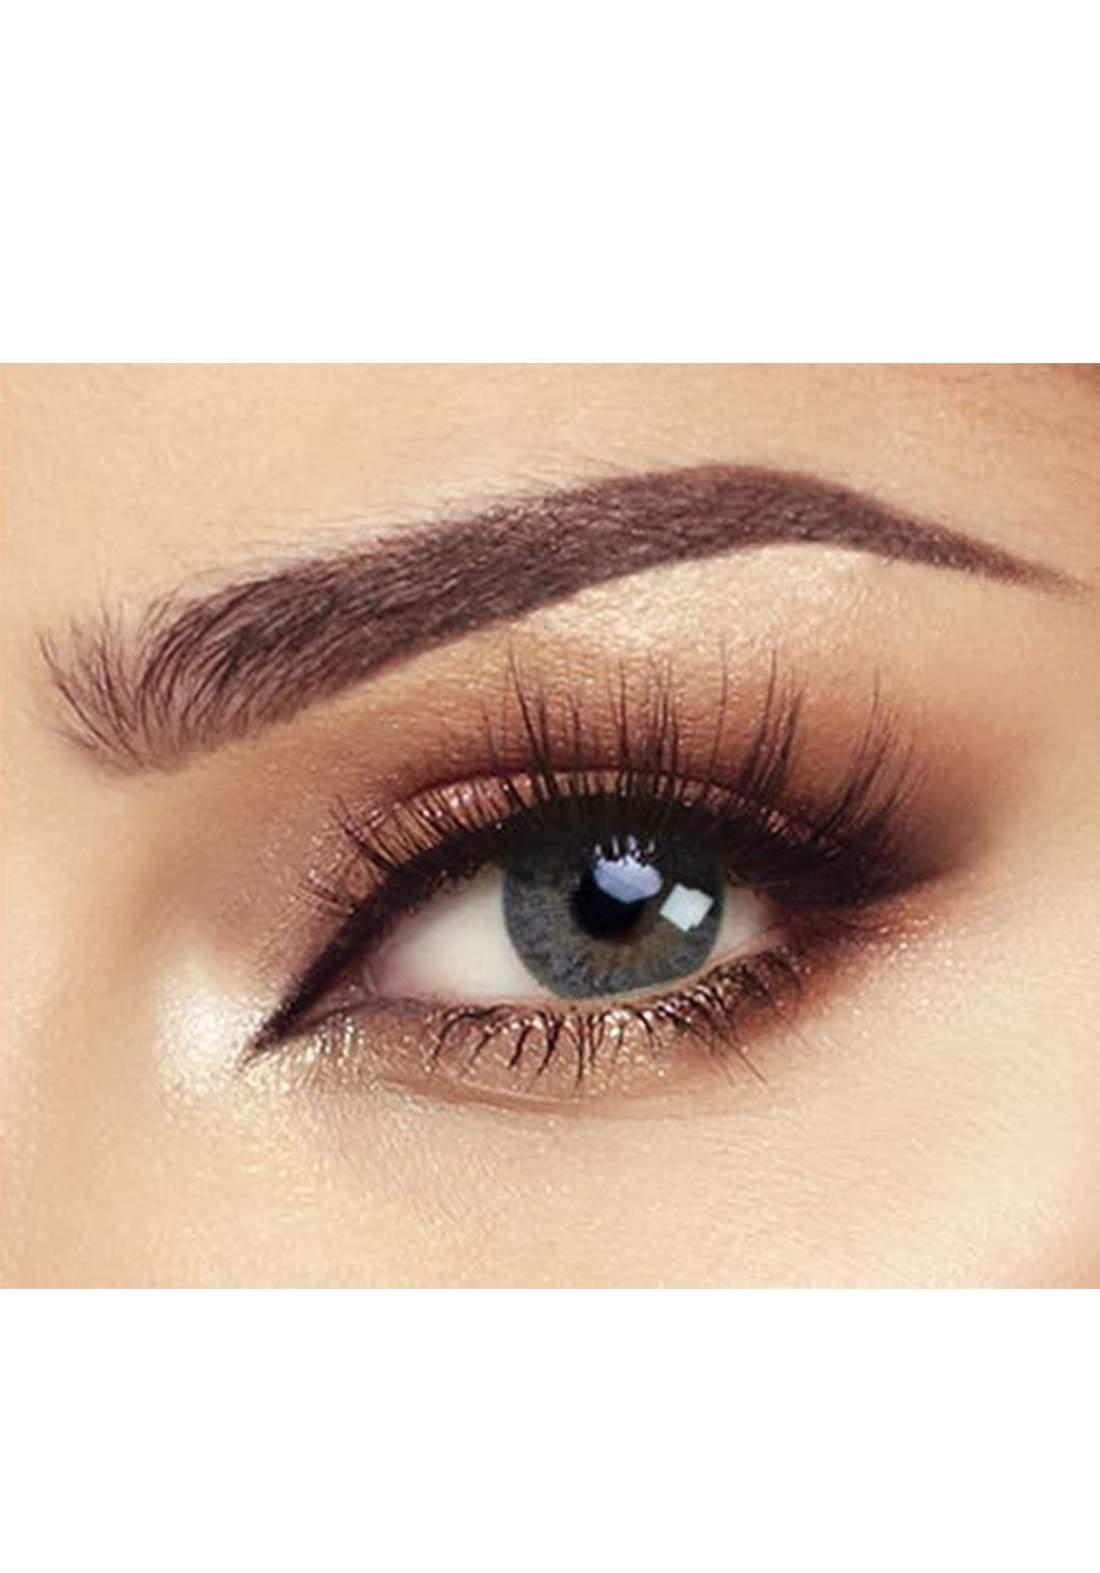 Bella Classic 301025 Contact Lenses 3 Months Use Natural - Gray No.26 عدسات لاصقة